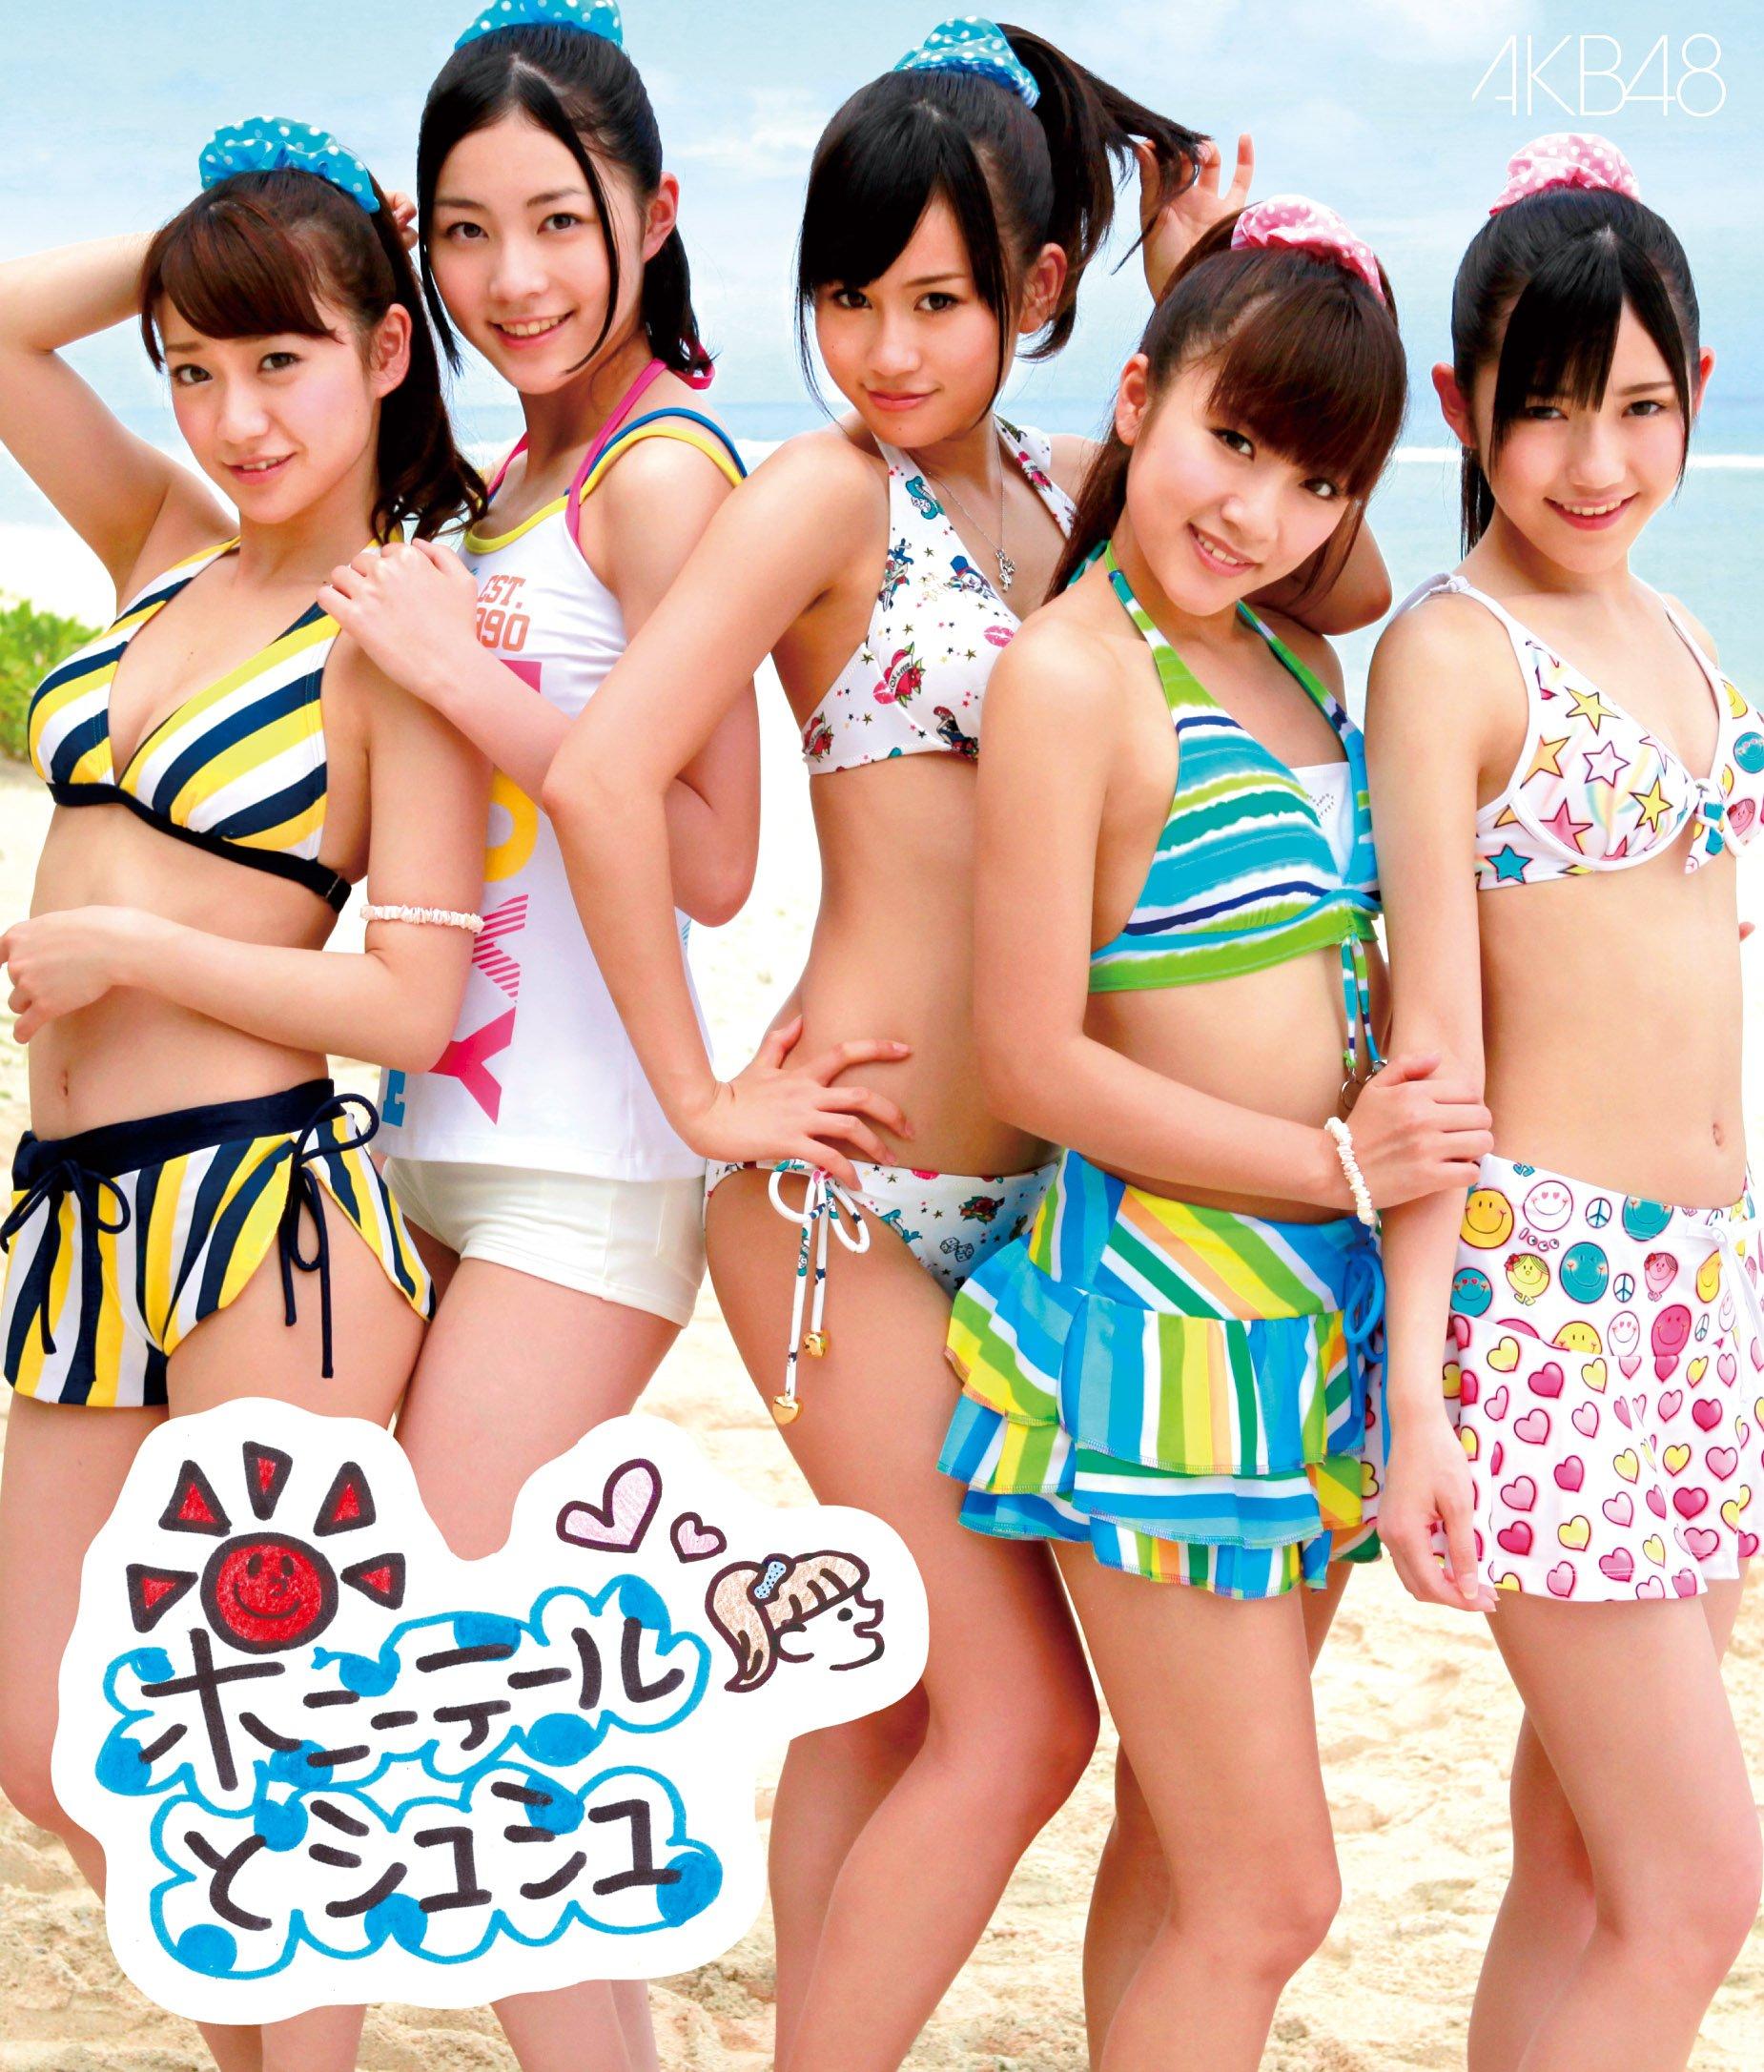 【AKB48】社会現象を巻き起こした「ポニーテールとシュシュ」から10年